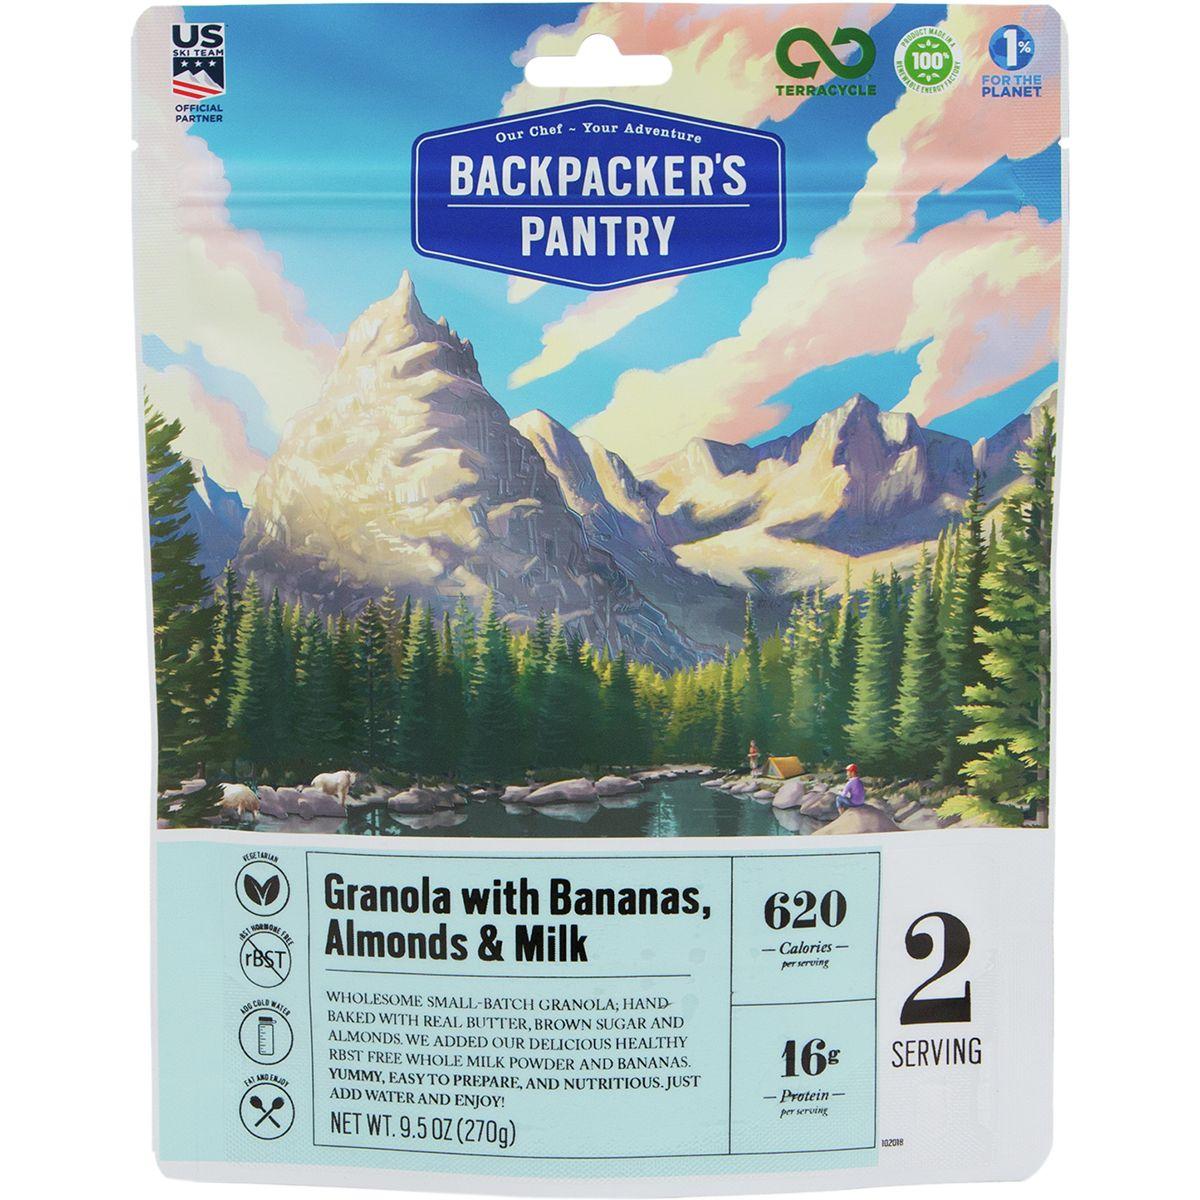 Backpacker's Pantry Granola with Bananas & Milk